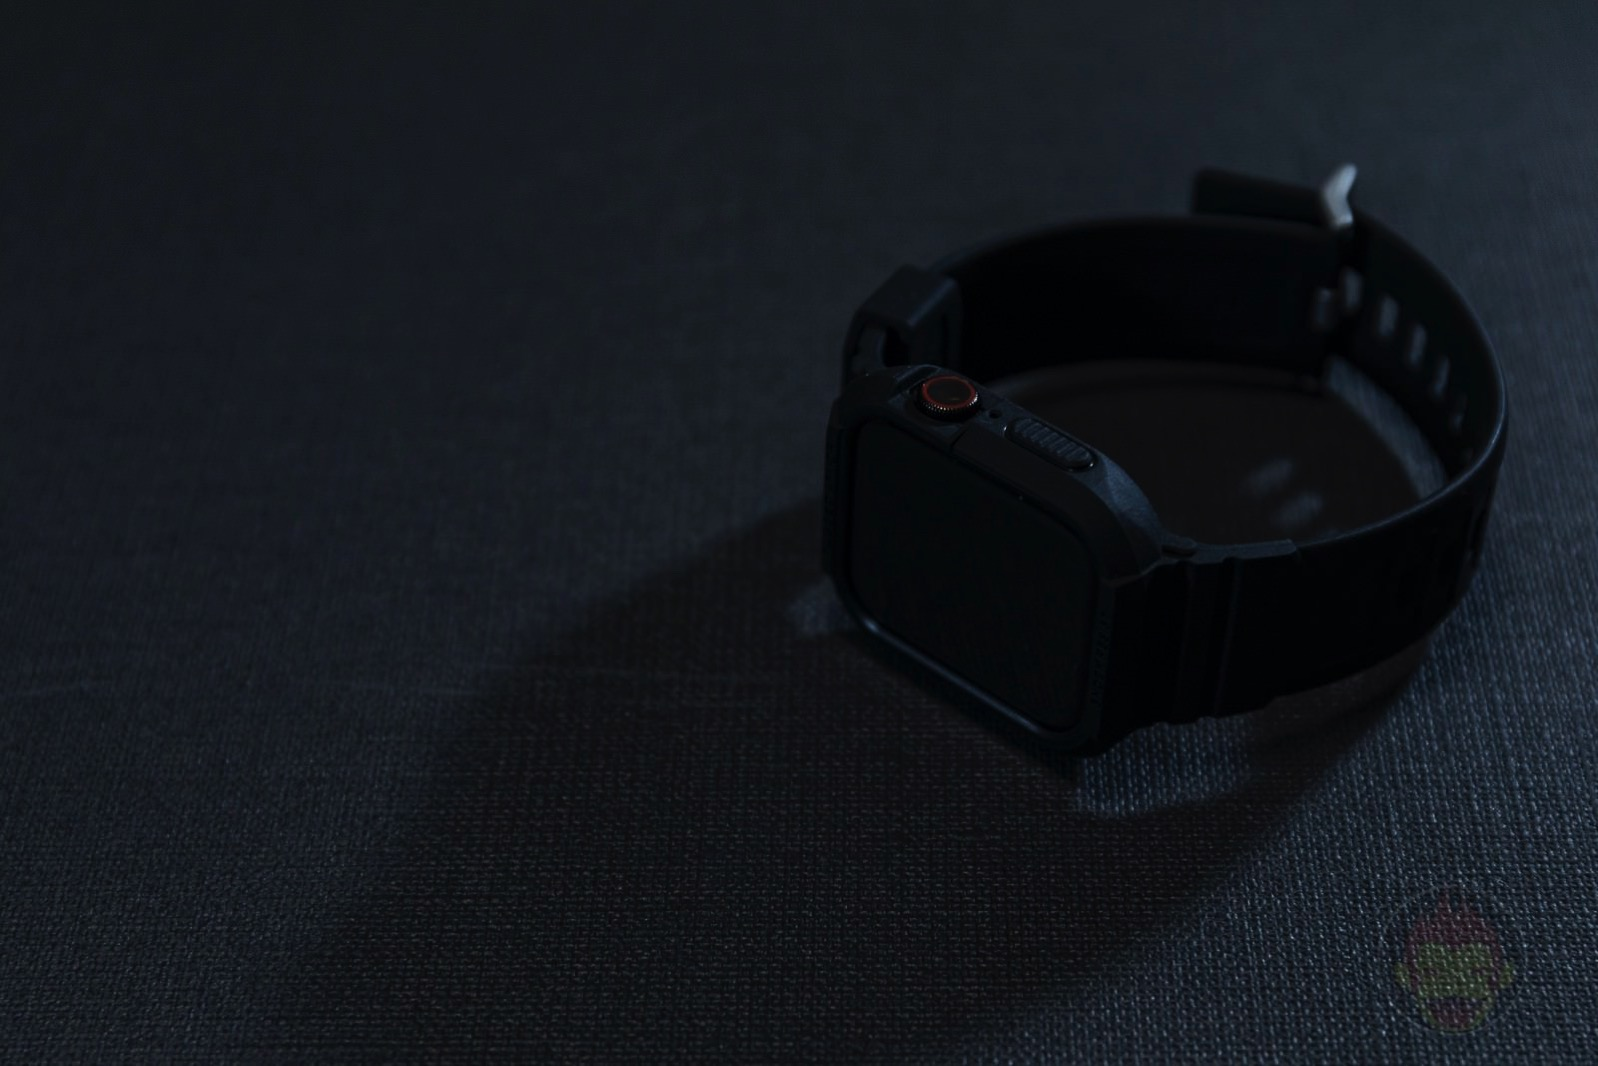 Spigen-Rugged-Armor-Pro-Apple-Watch-Band-and-case-01.jpg